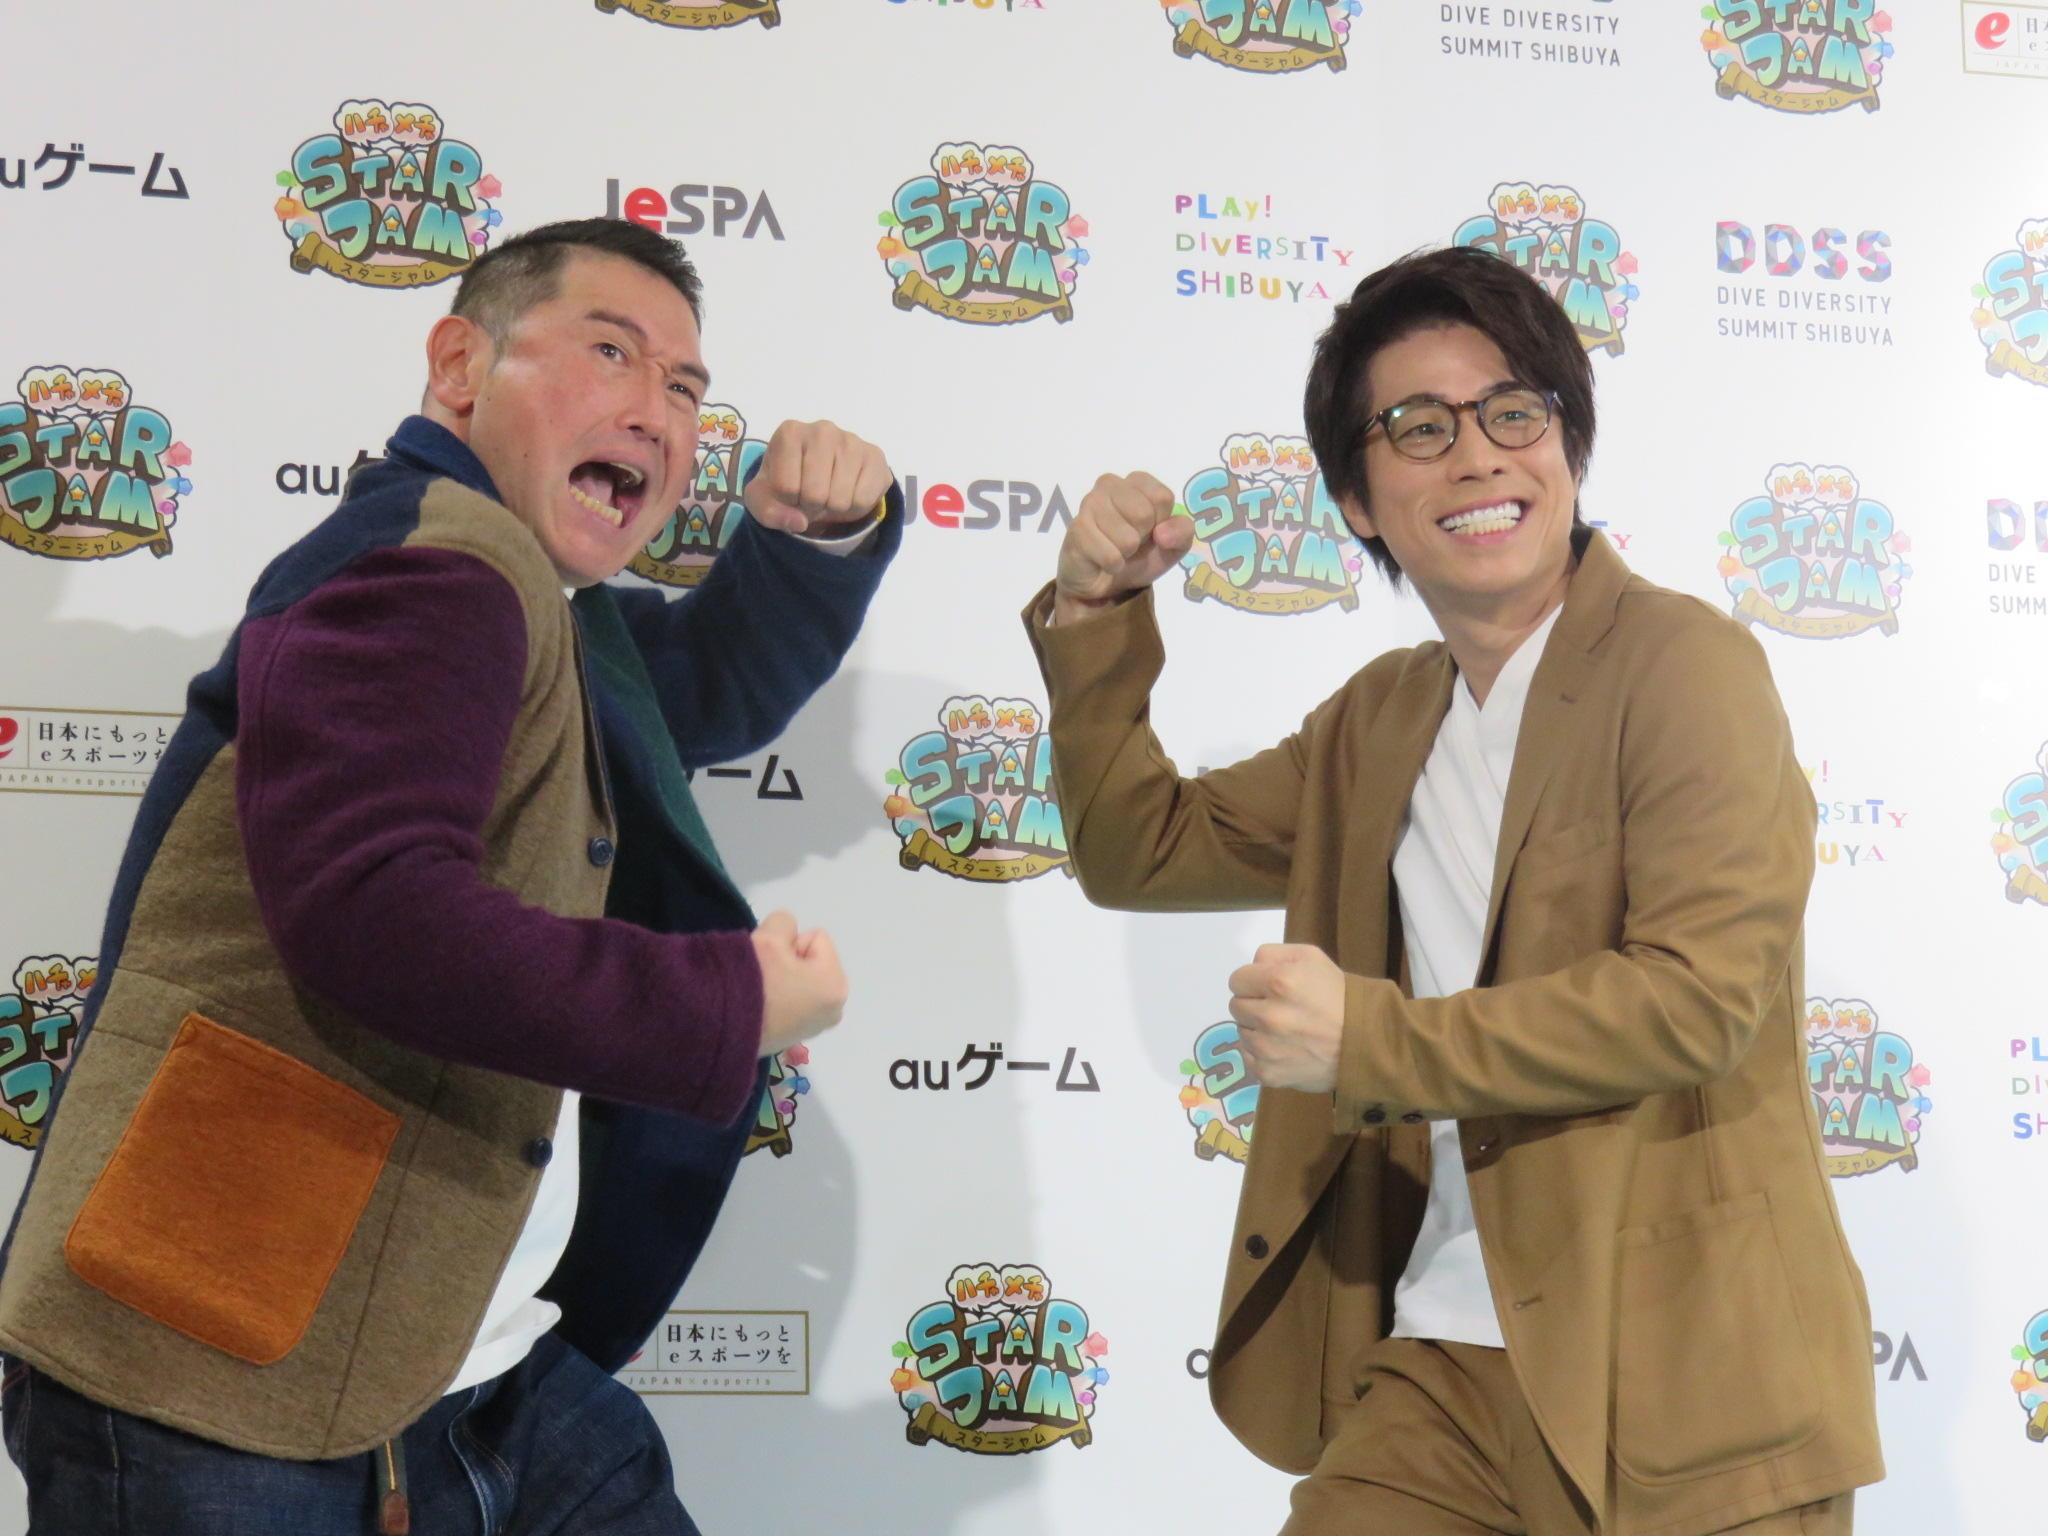 http://news.yoshimoto.co.jp/20171112005356-36b0cbde0bad8e2884dbc052c4f901f321f2e778.jpg